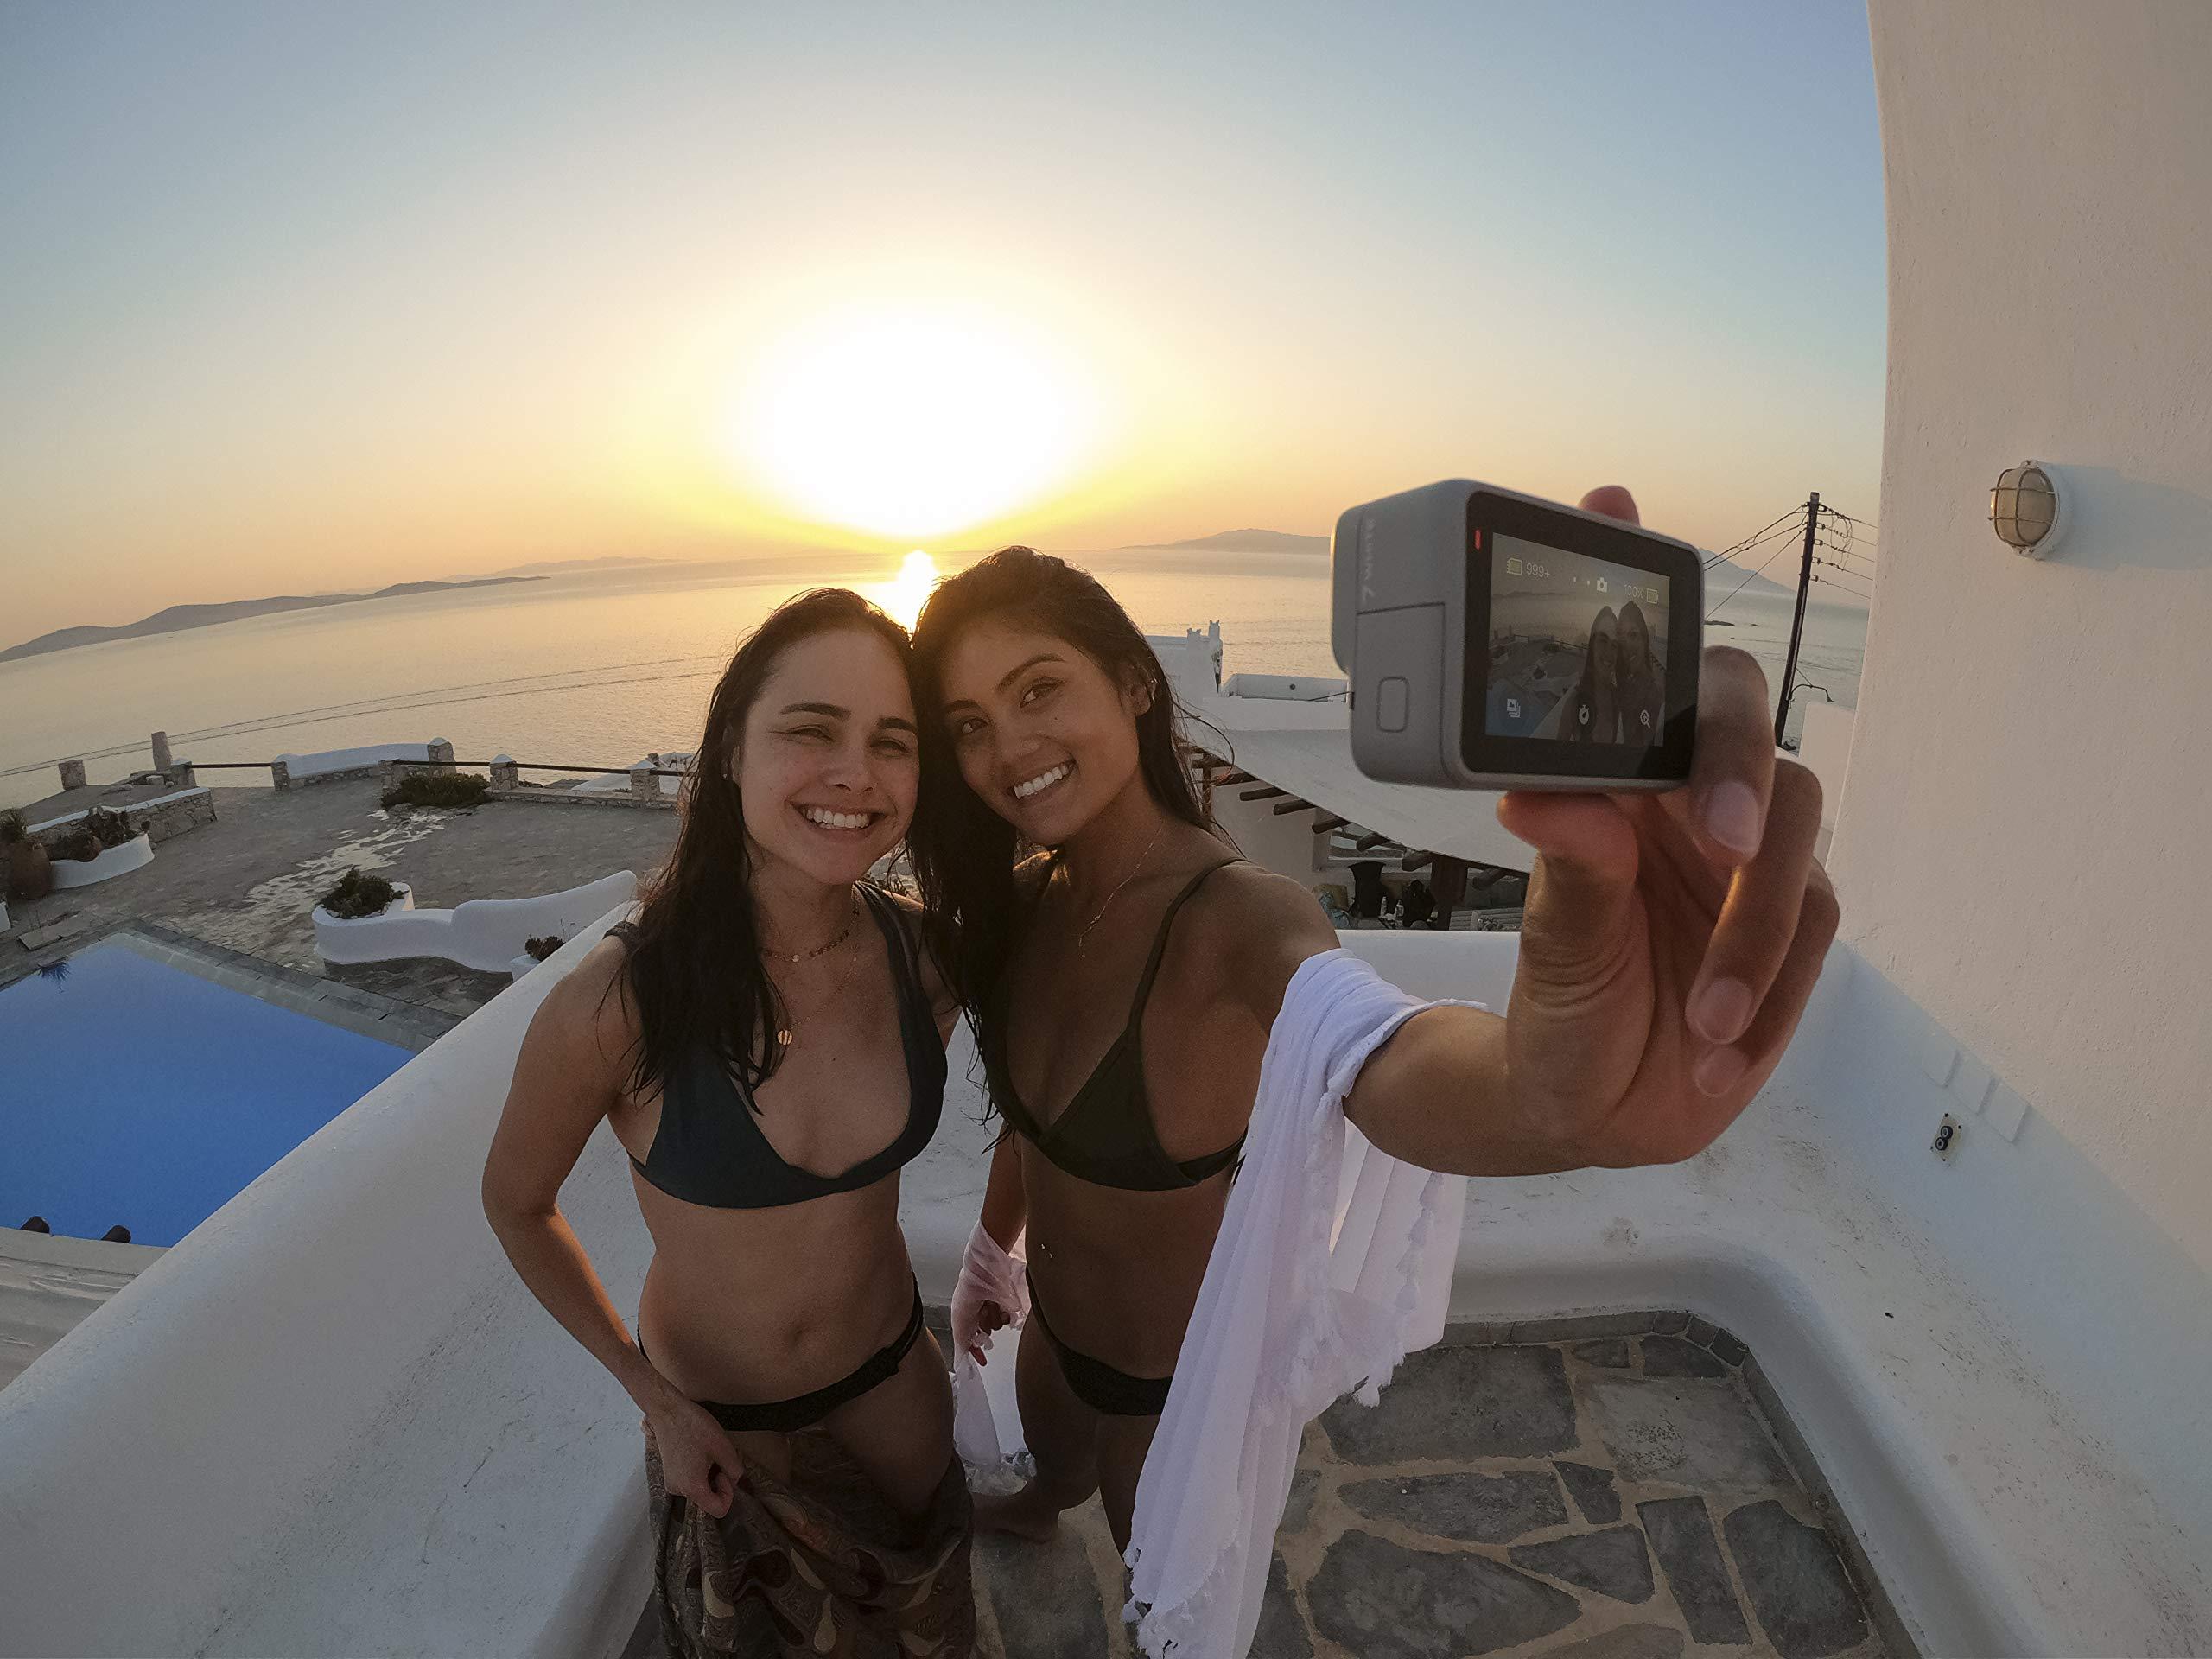 GoPro HERO7 White - Waterproof Digital Action Camera with Sleeve Plus Lanyard 6